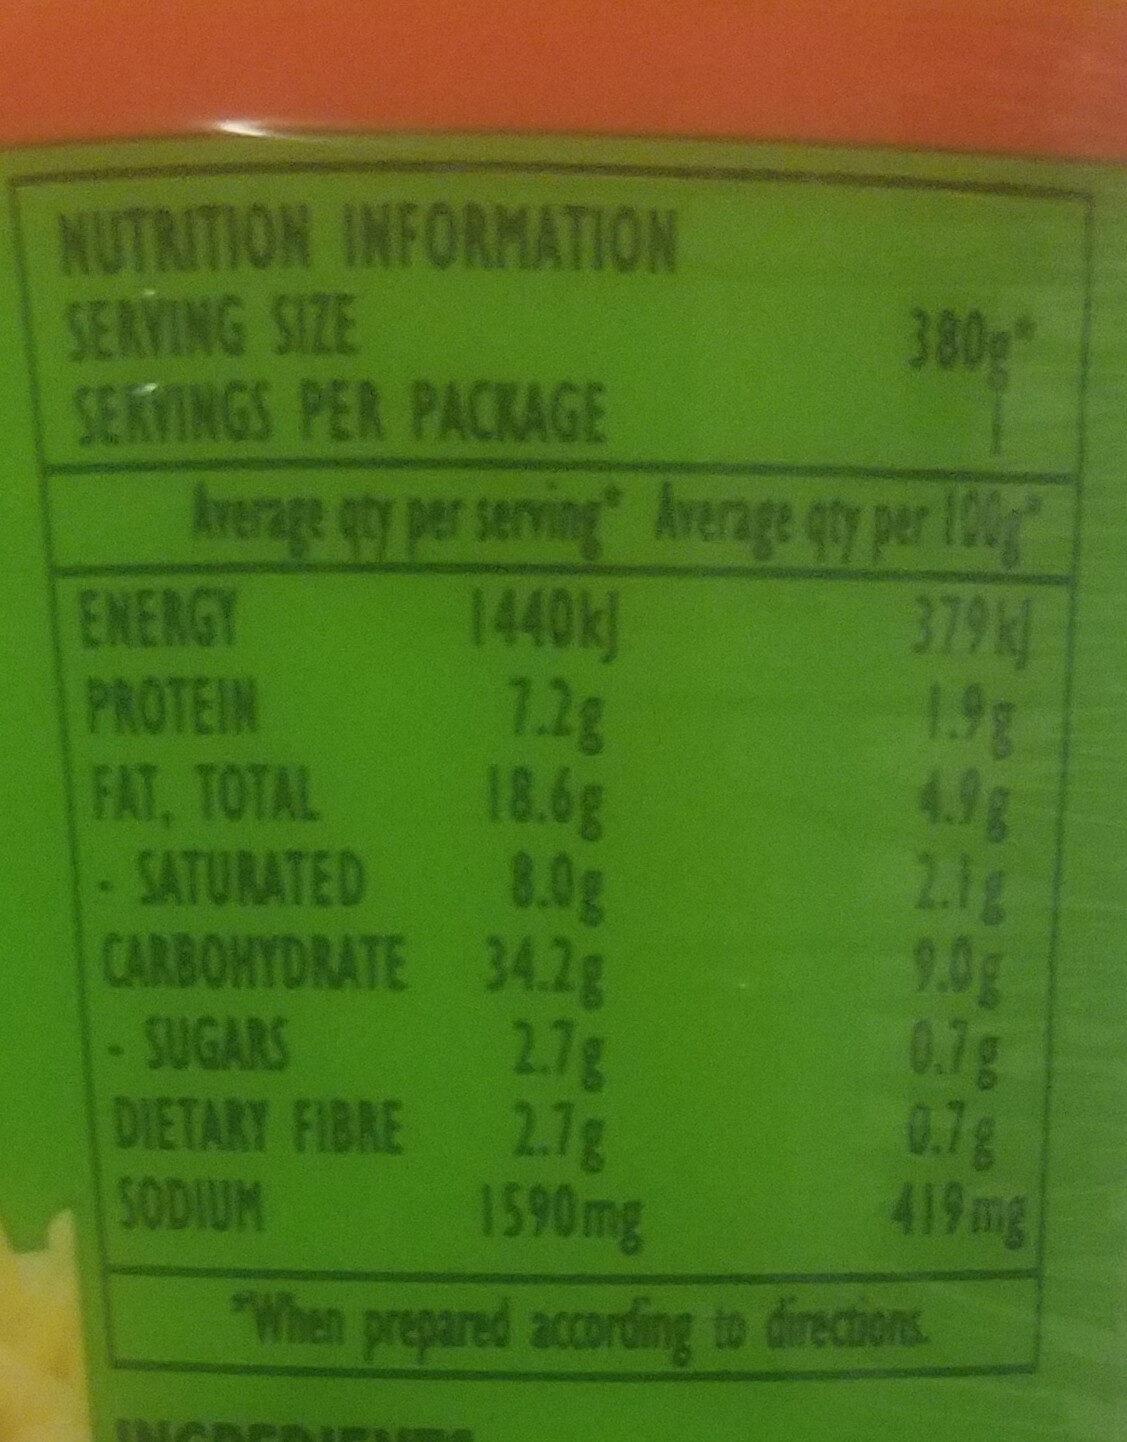 Noodles with Orientel Chicken Flavour - Nutrition facts - en